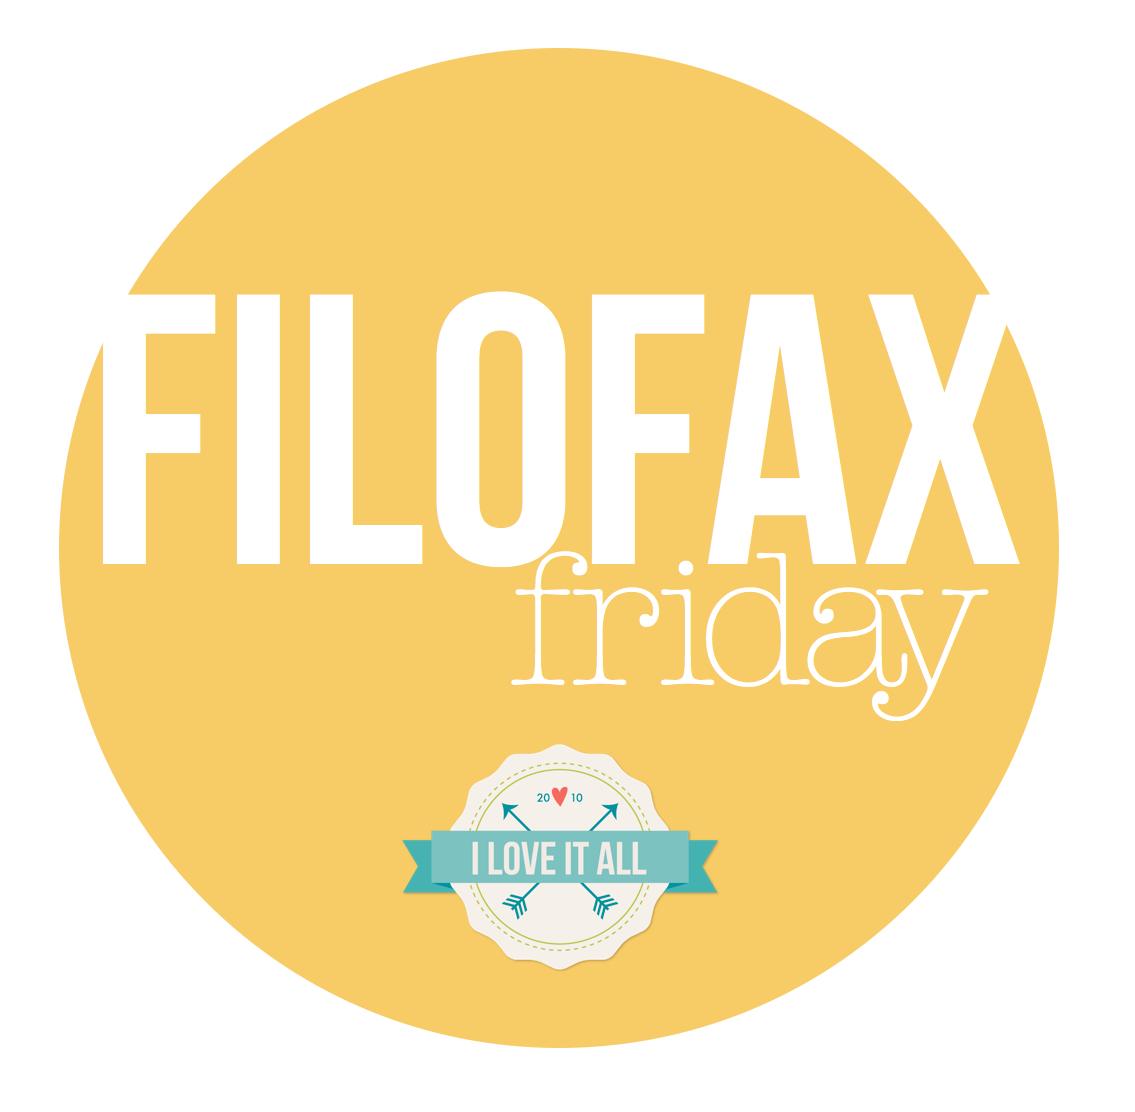 Filofax Friday | iloveitallwithmonikawright.com